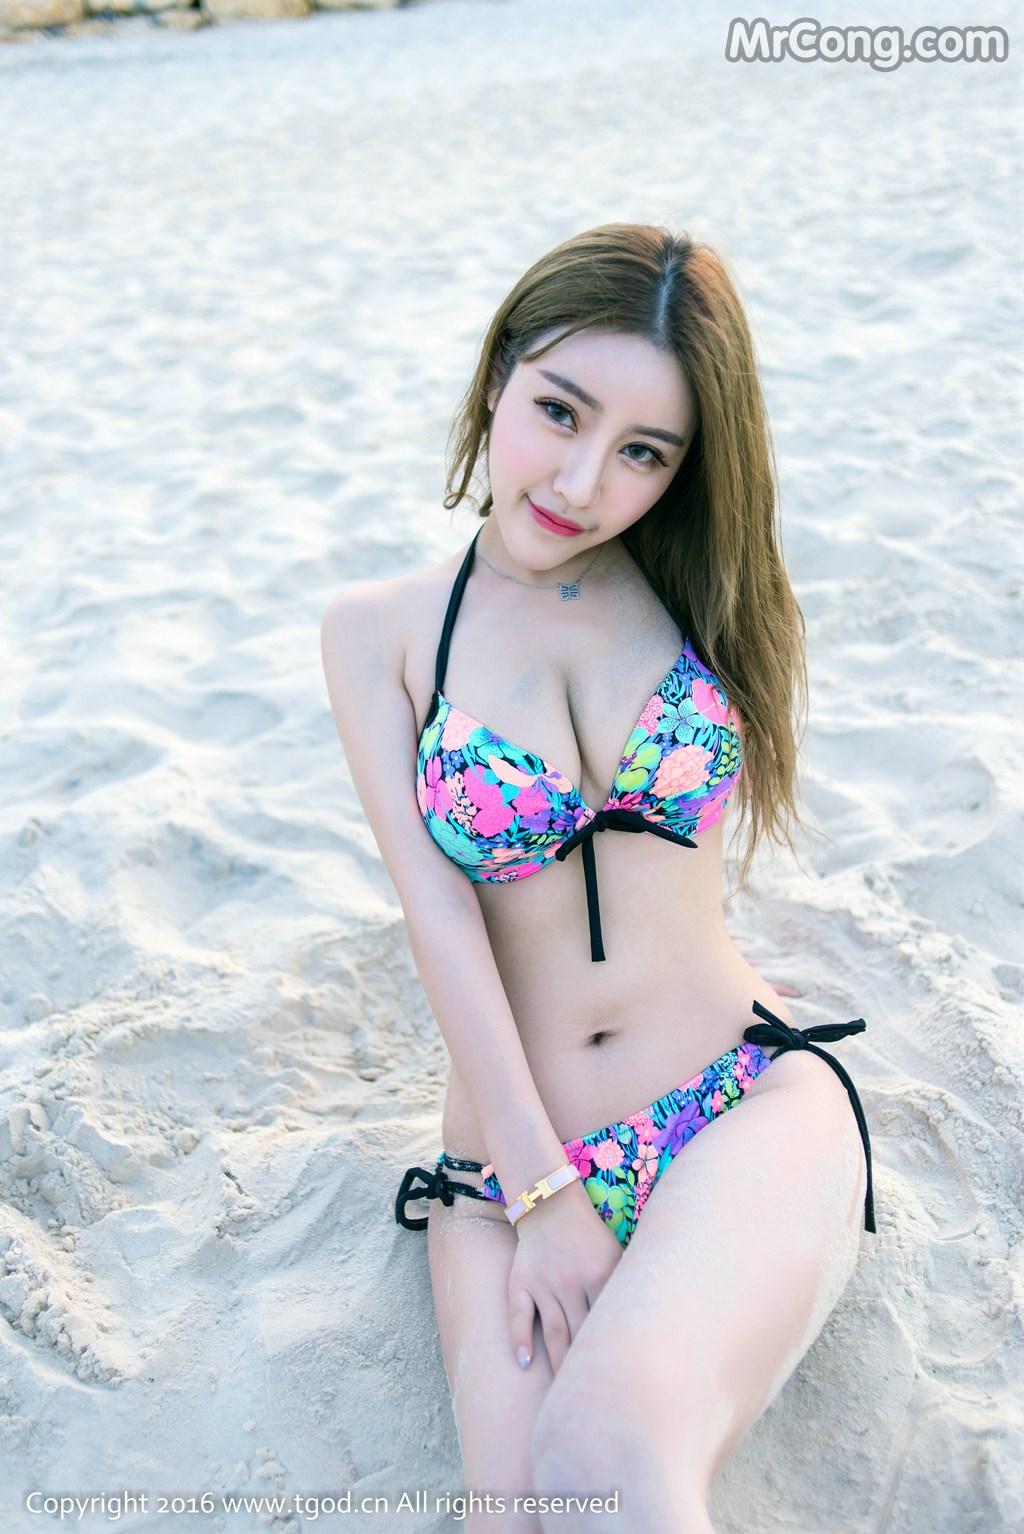 TGOD 2016-04-05: Model Jing Er (静儿) (45P)